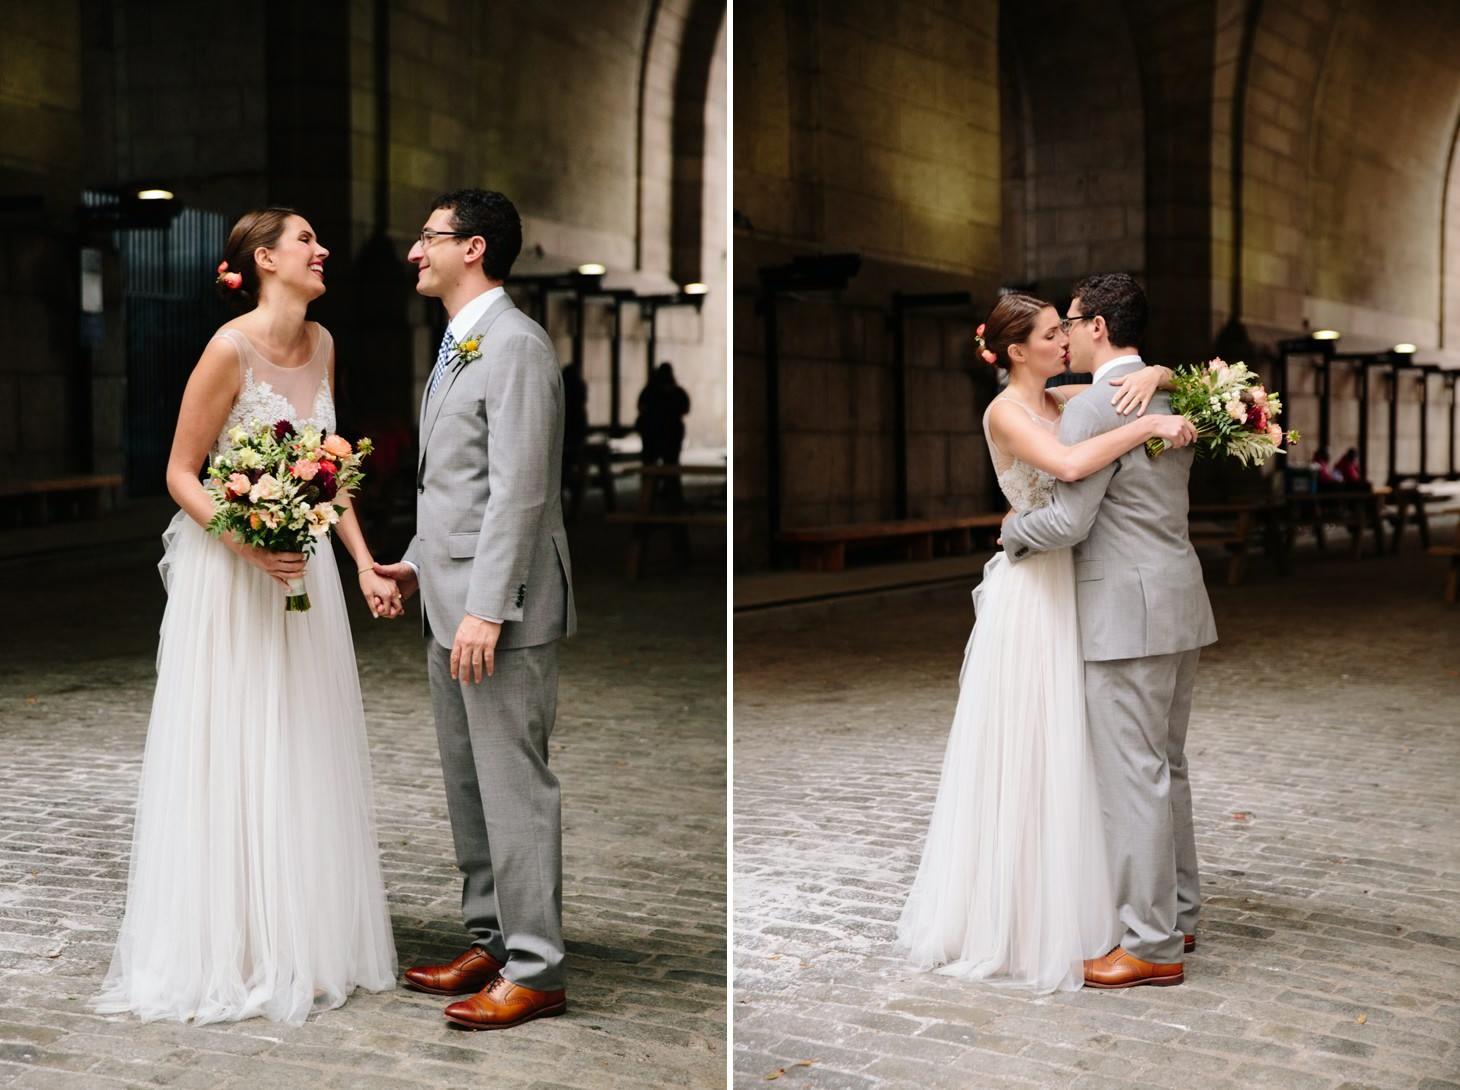 004-nyc-dumbo-loft-brooklyn-wedding-photographer-smitten-chickens-photo-.jpg